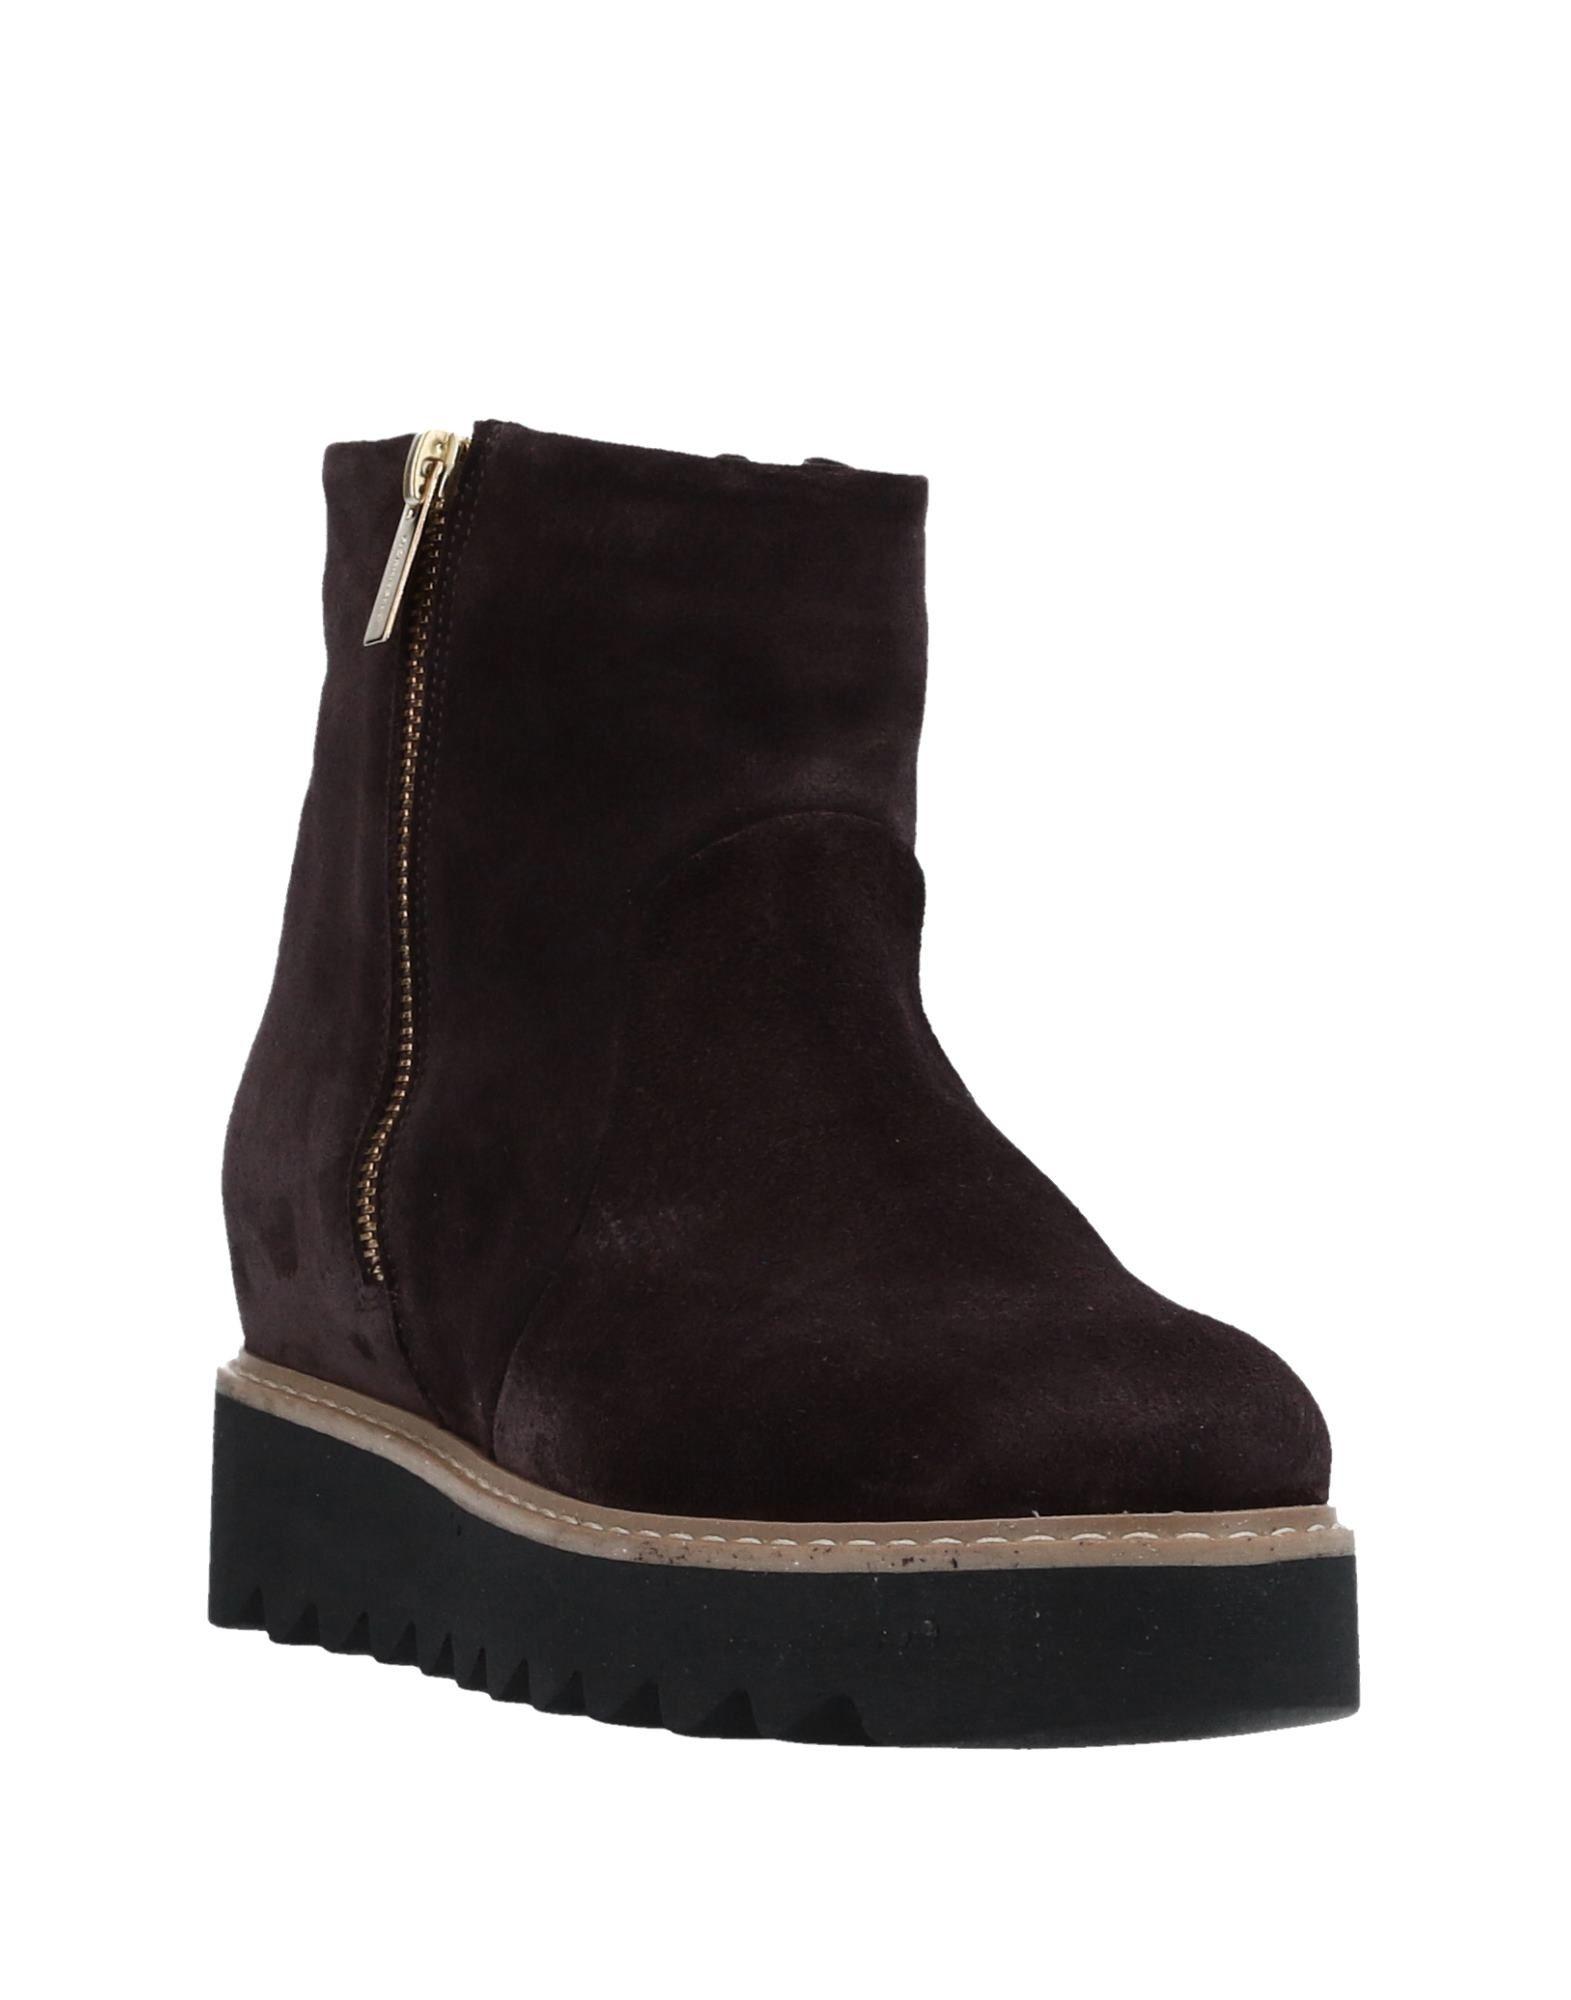 Fiorangelo Fiorangelo  Stiefelette Damen  11510606PU Heiße Schuhe 0d1299